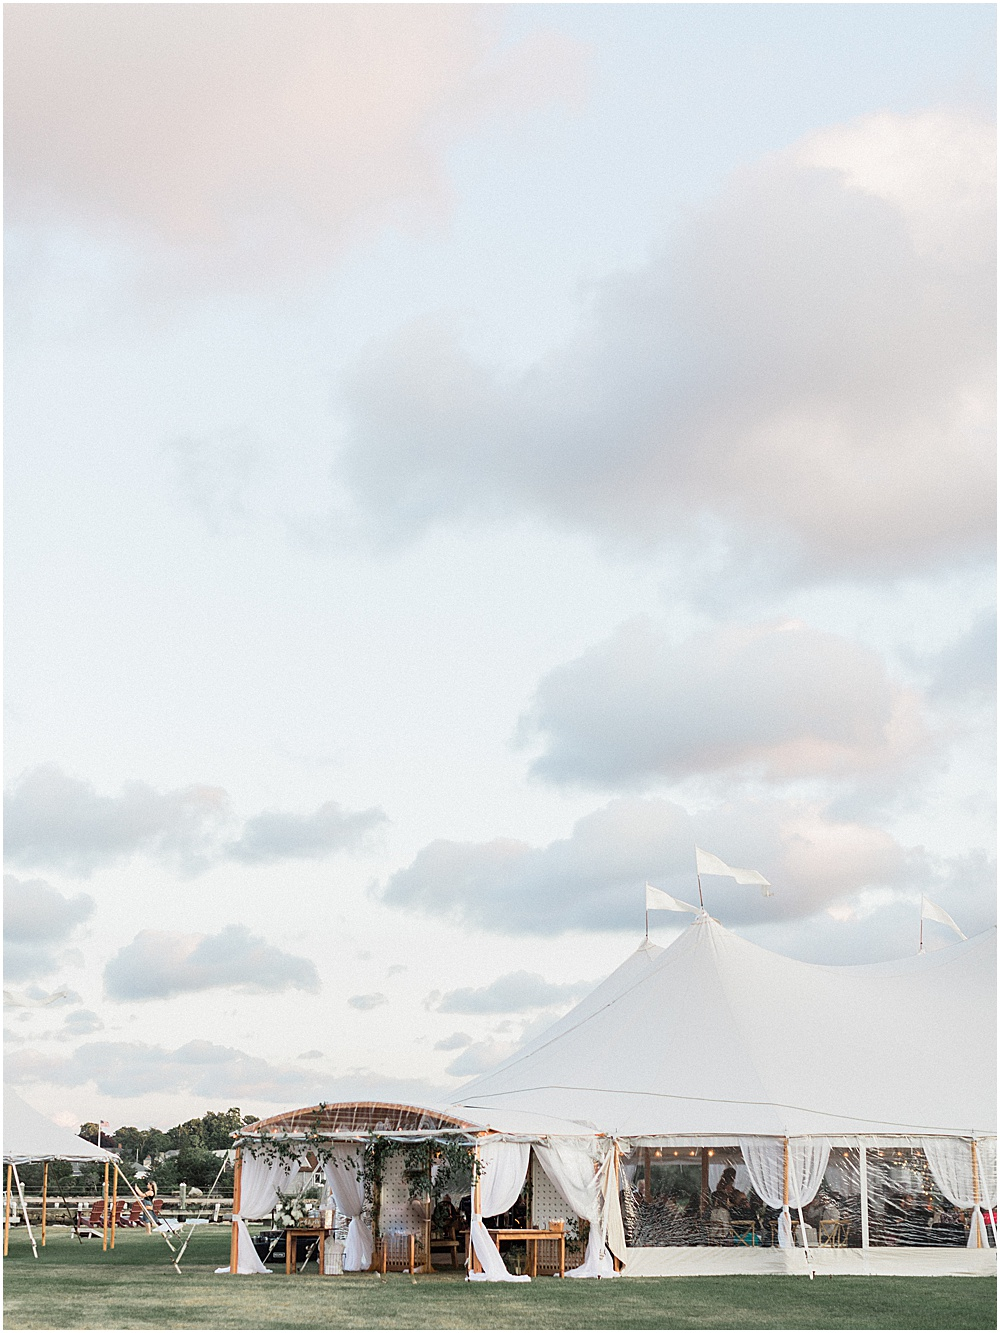 tabor_academy_rebecca_chris_tented_interior_trees_engagement_session_cape_cod_massachusetts_boston_wedding_photographer_meredith_jane_photography_photo_0725.jpg